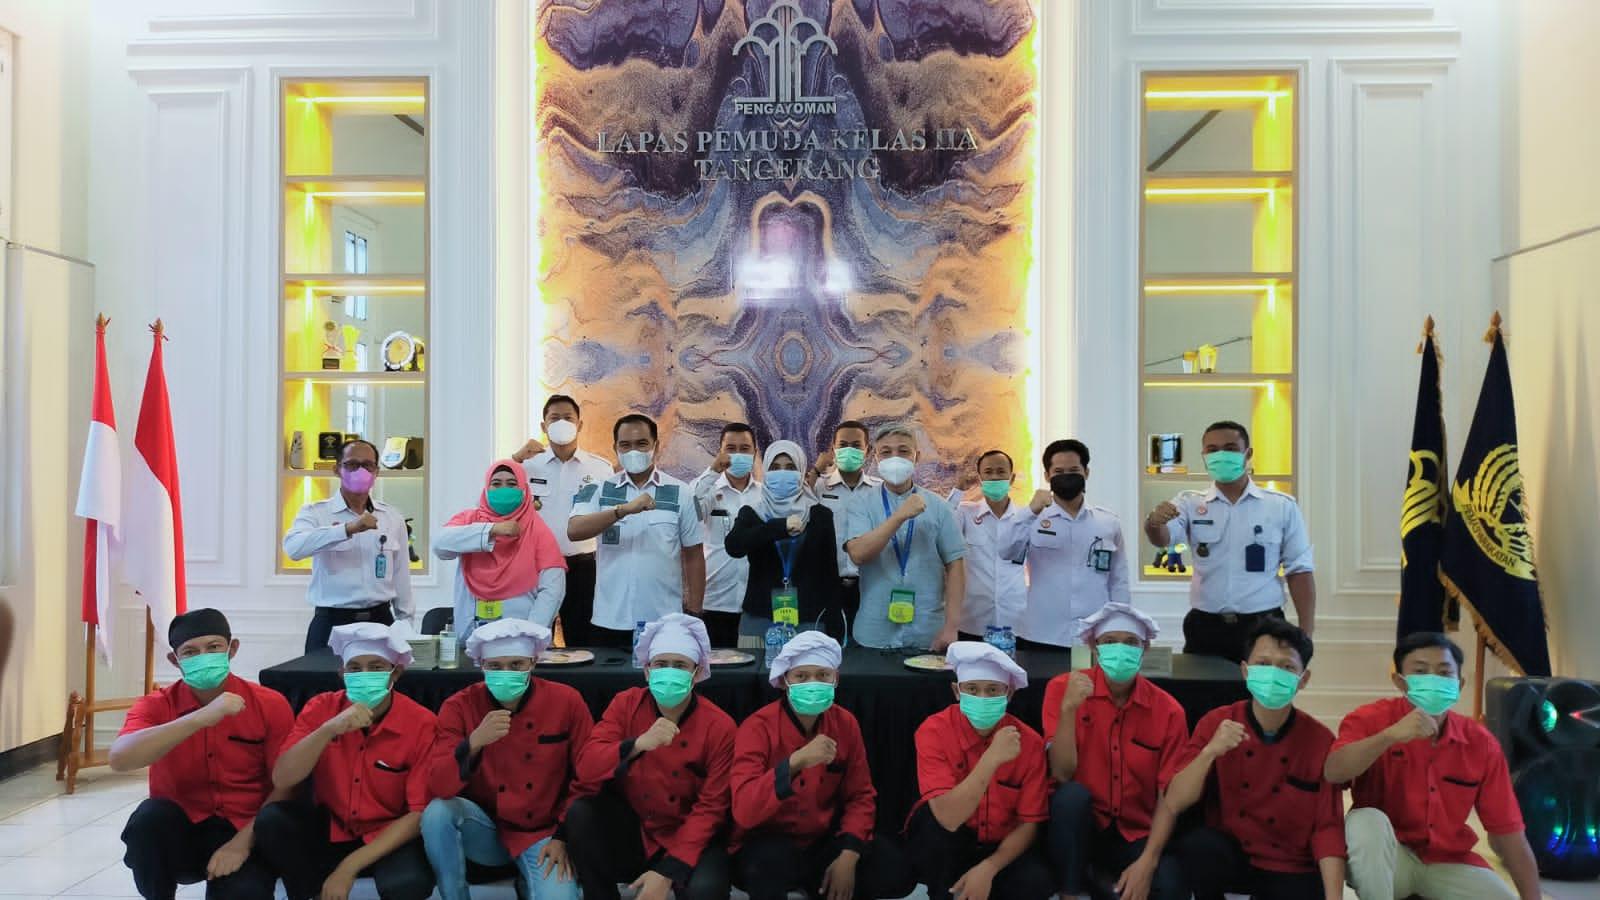 Gambar Gandeng LKP Citramas, Lapas Pemuda Tangerang Ciptakan Dapur Bersih Hygiene 17